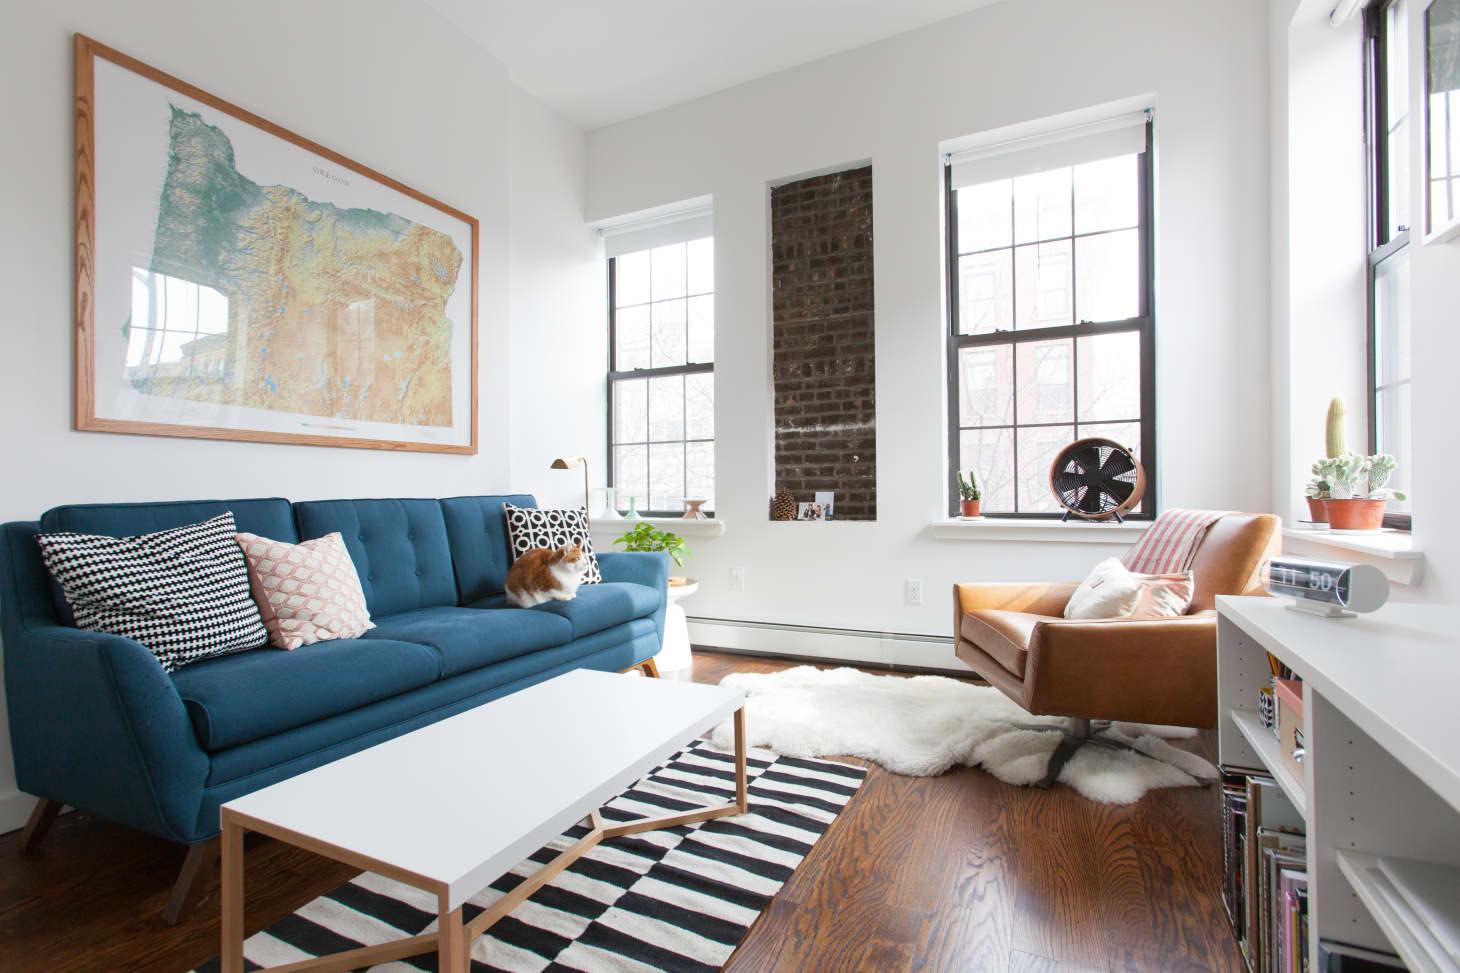 253bd1a61cb7 Living Room Decorating Ideas - Home Design Photos | Apartment Therapy